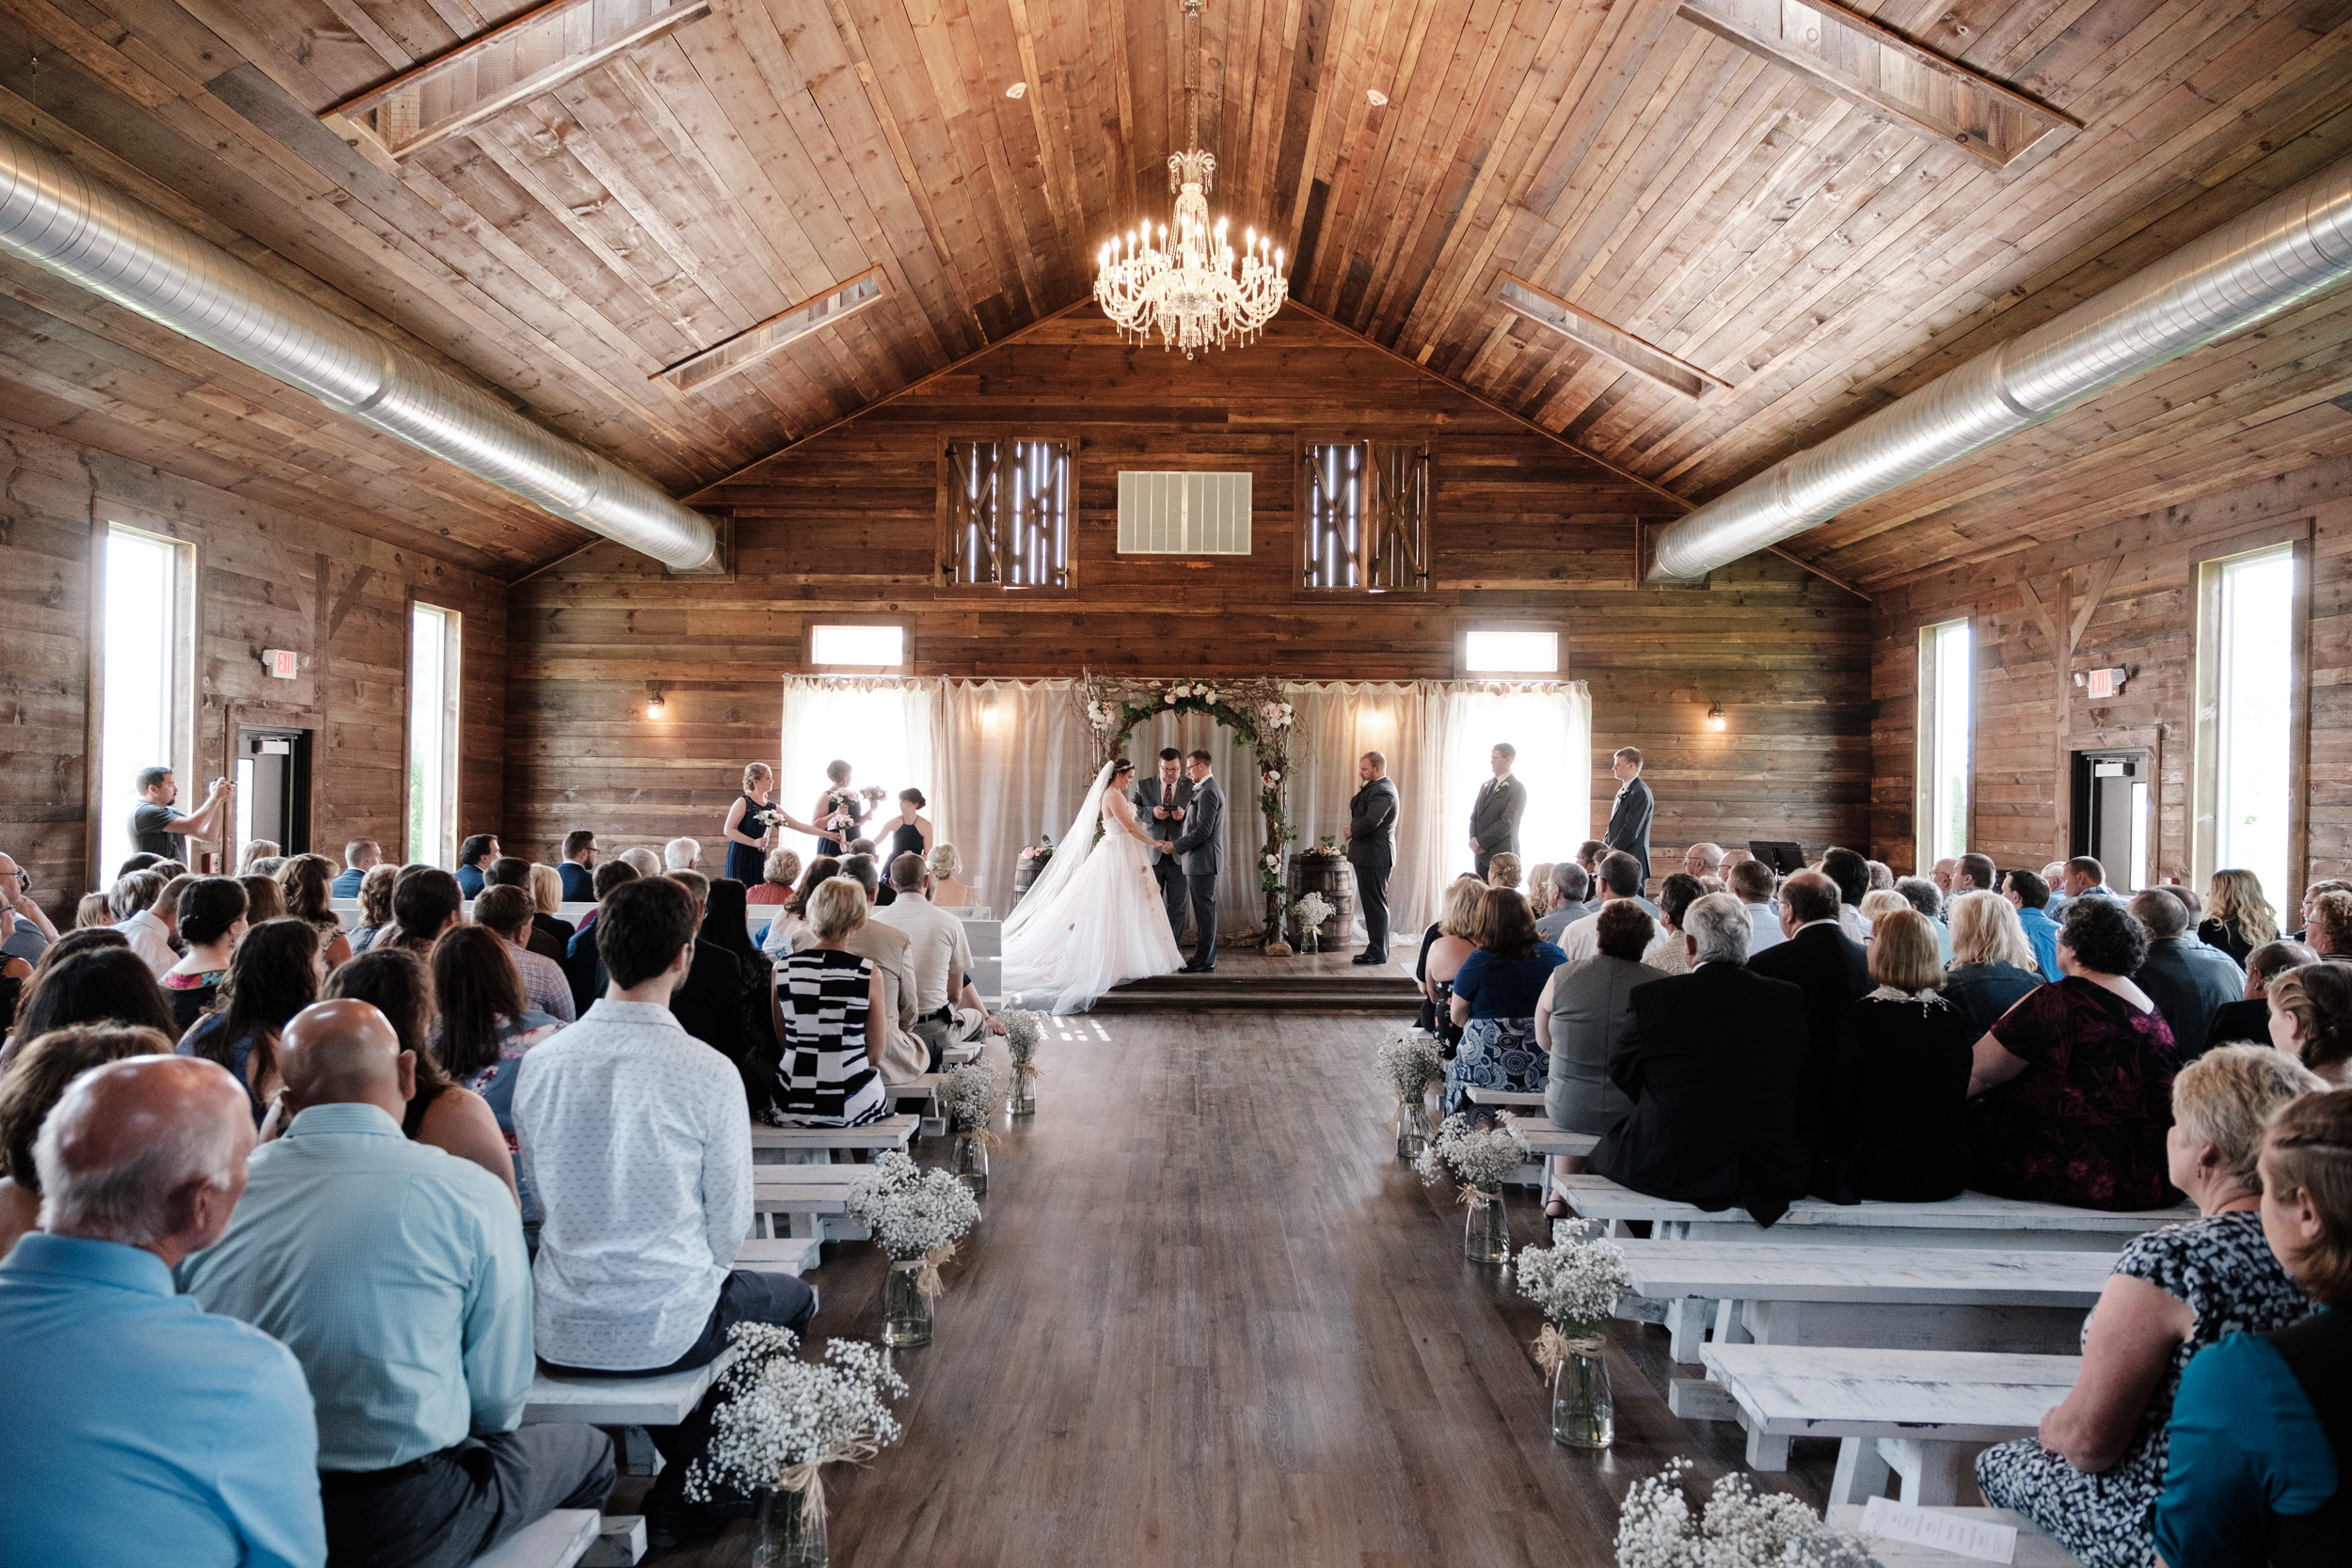 19-06-22-Ryan-Katie-The-Fields-Reserve-Wedding-33.jpg